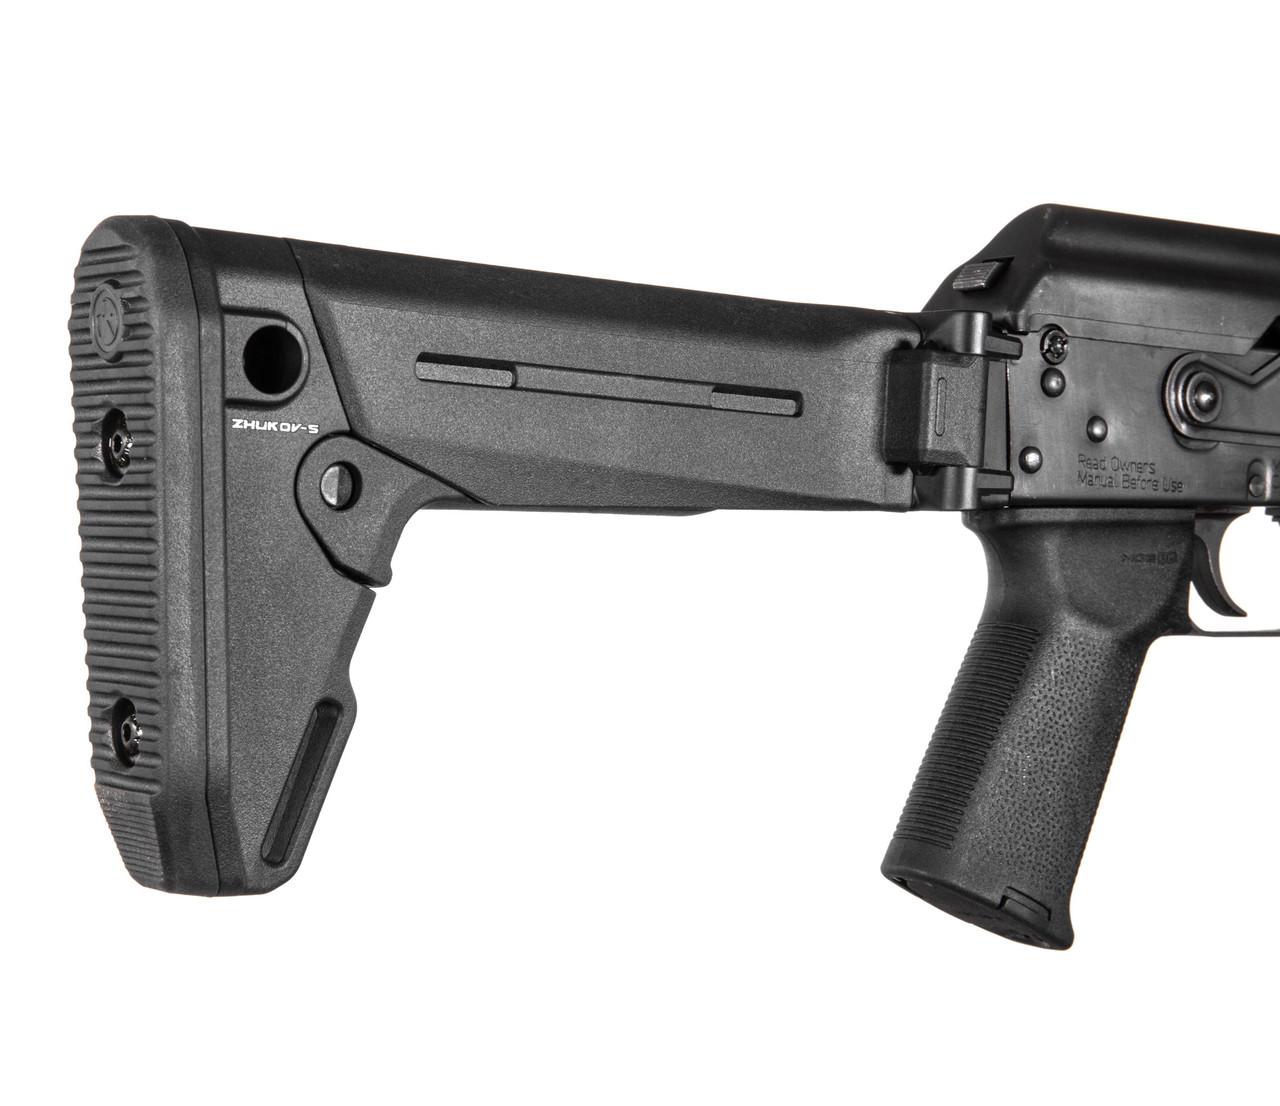 Magpul Zhukov-S Yugo AK-47 Stock